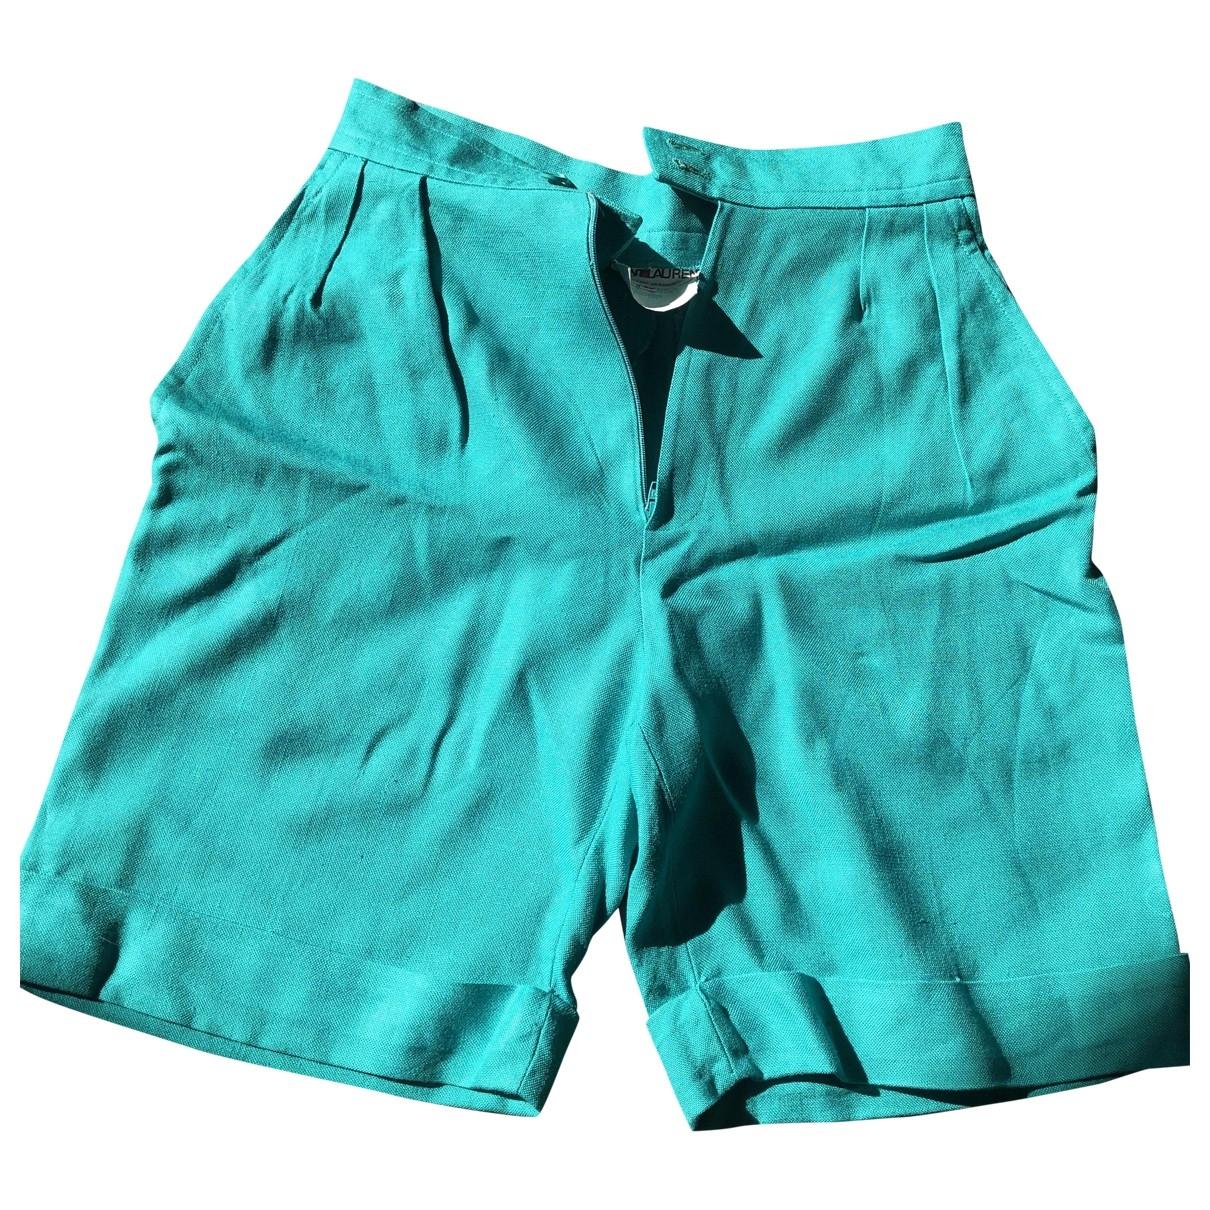 Yves Saint Laurent \N Shorts in  Tuerkis Viskose